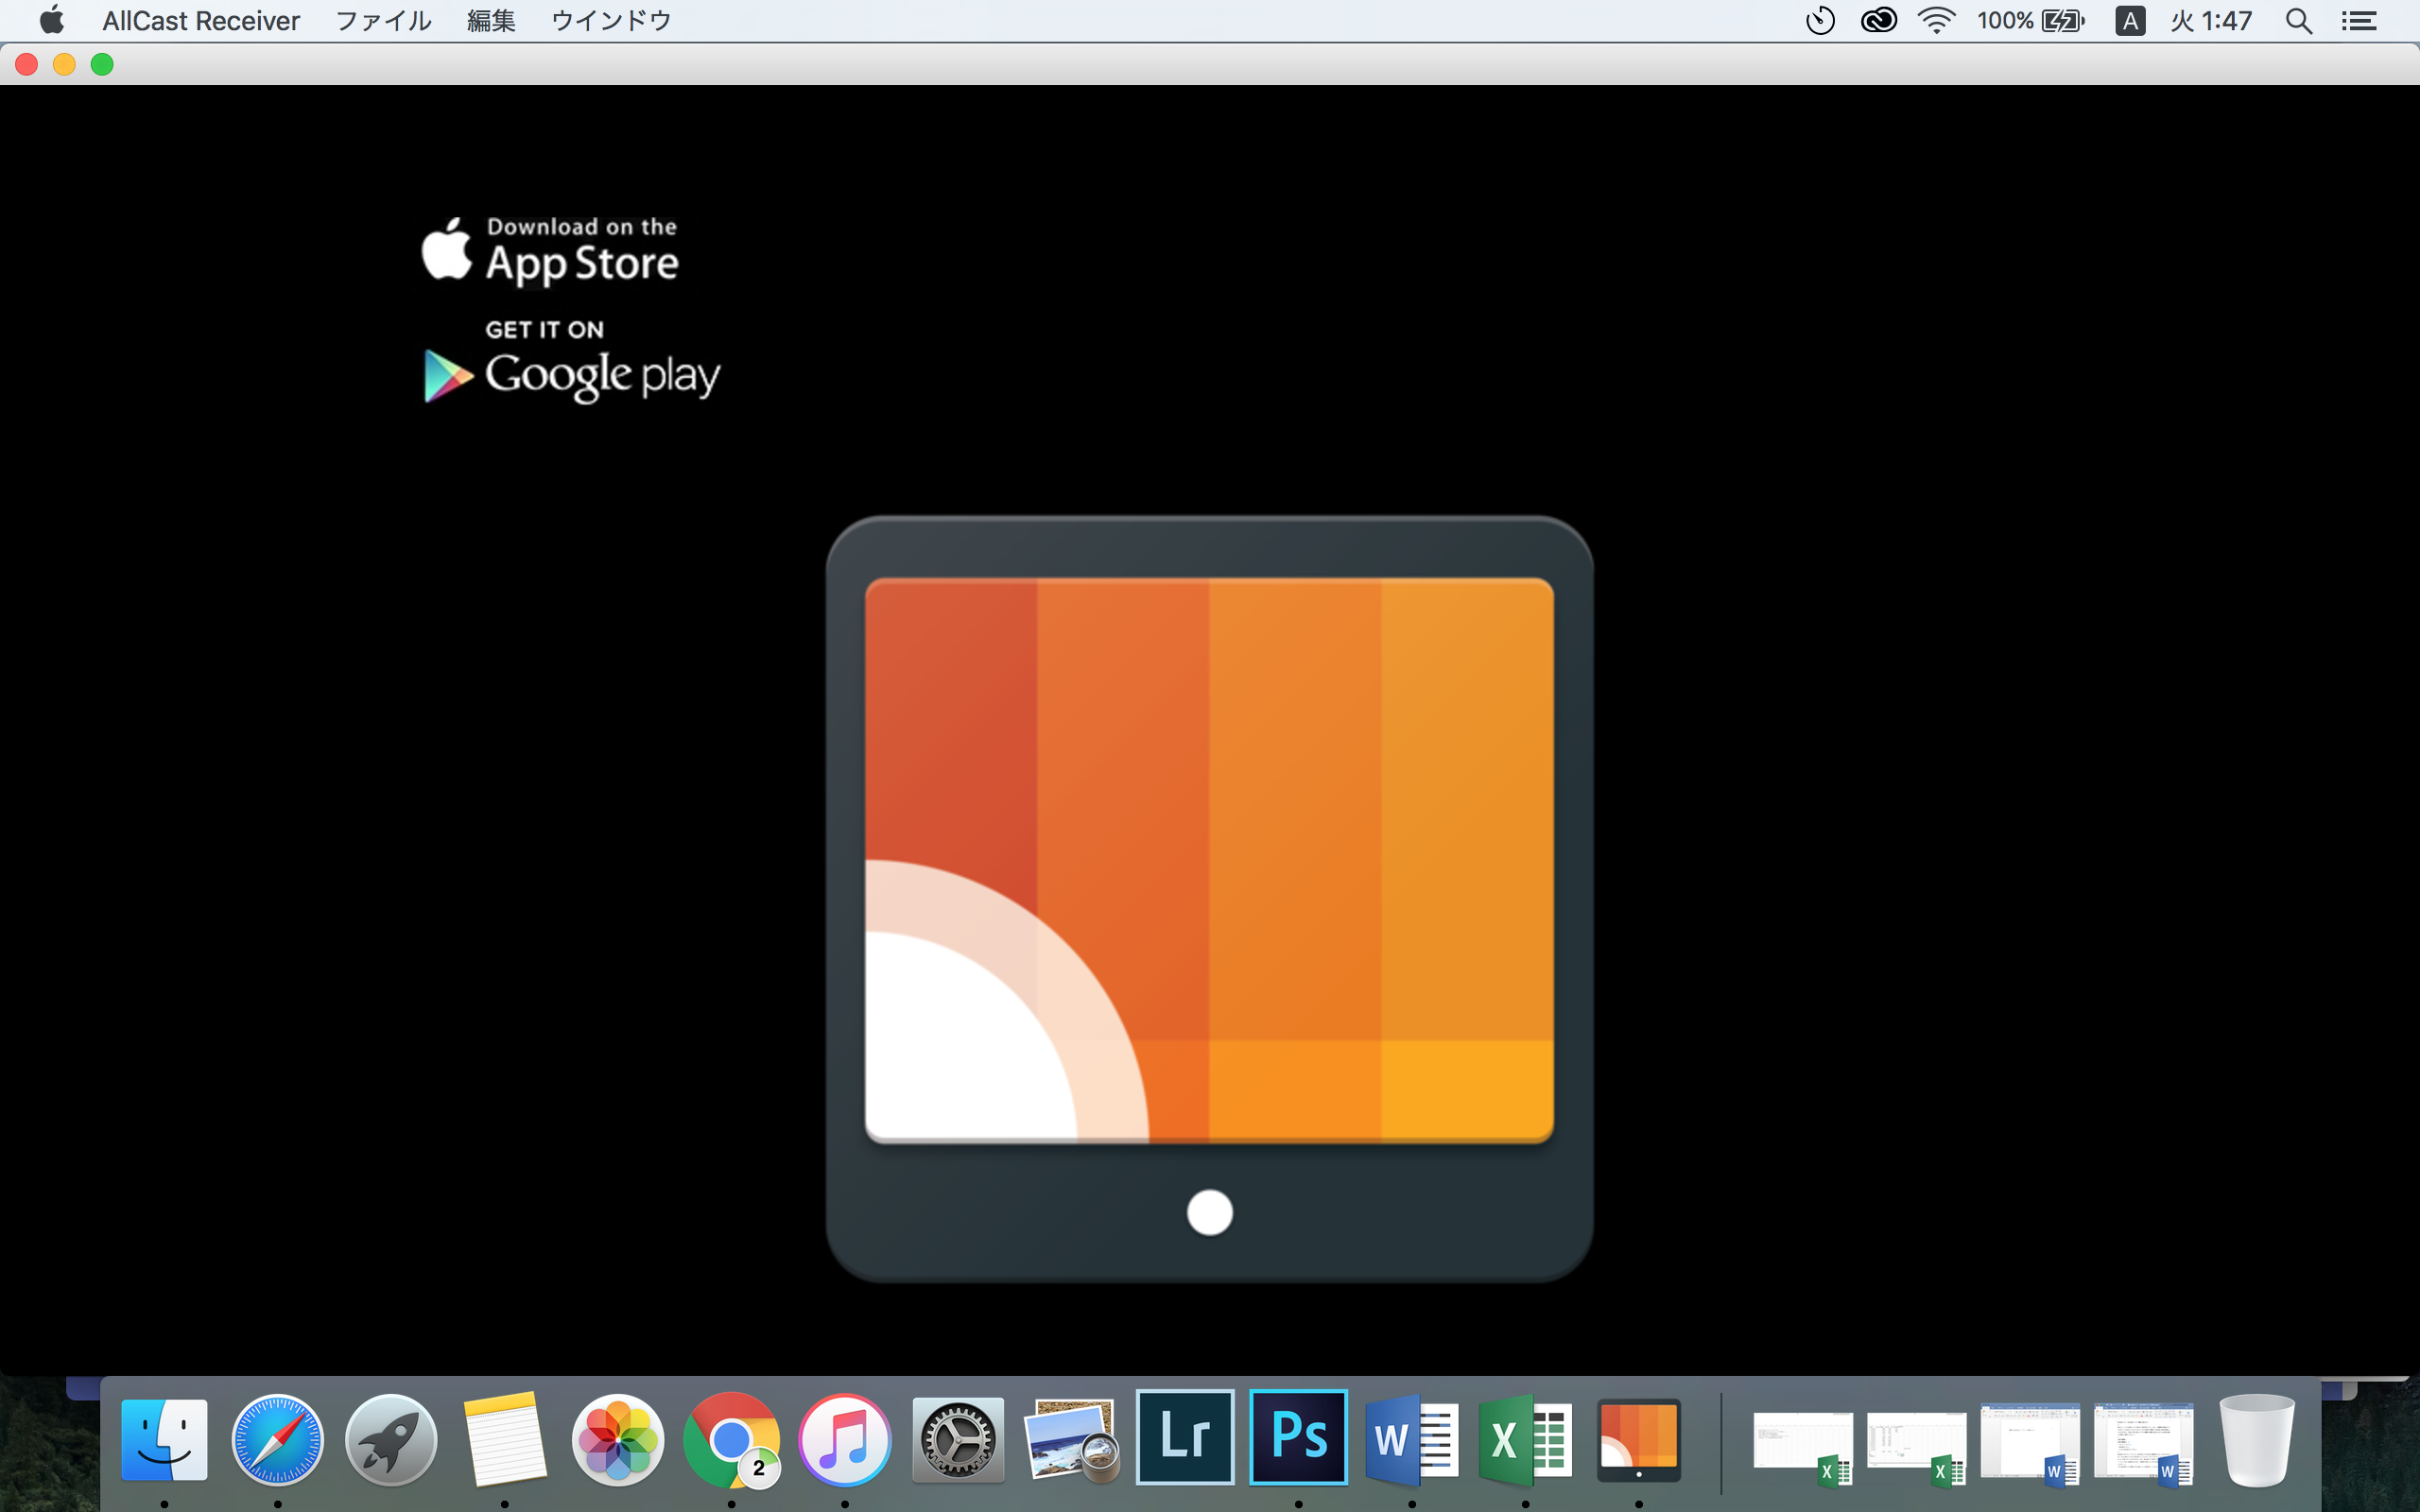 Quicktime player windows 7 download